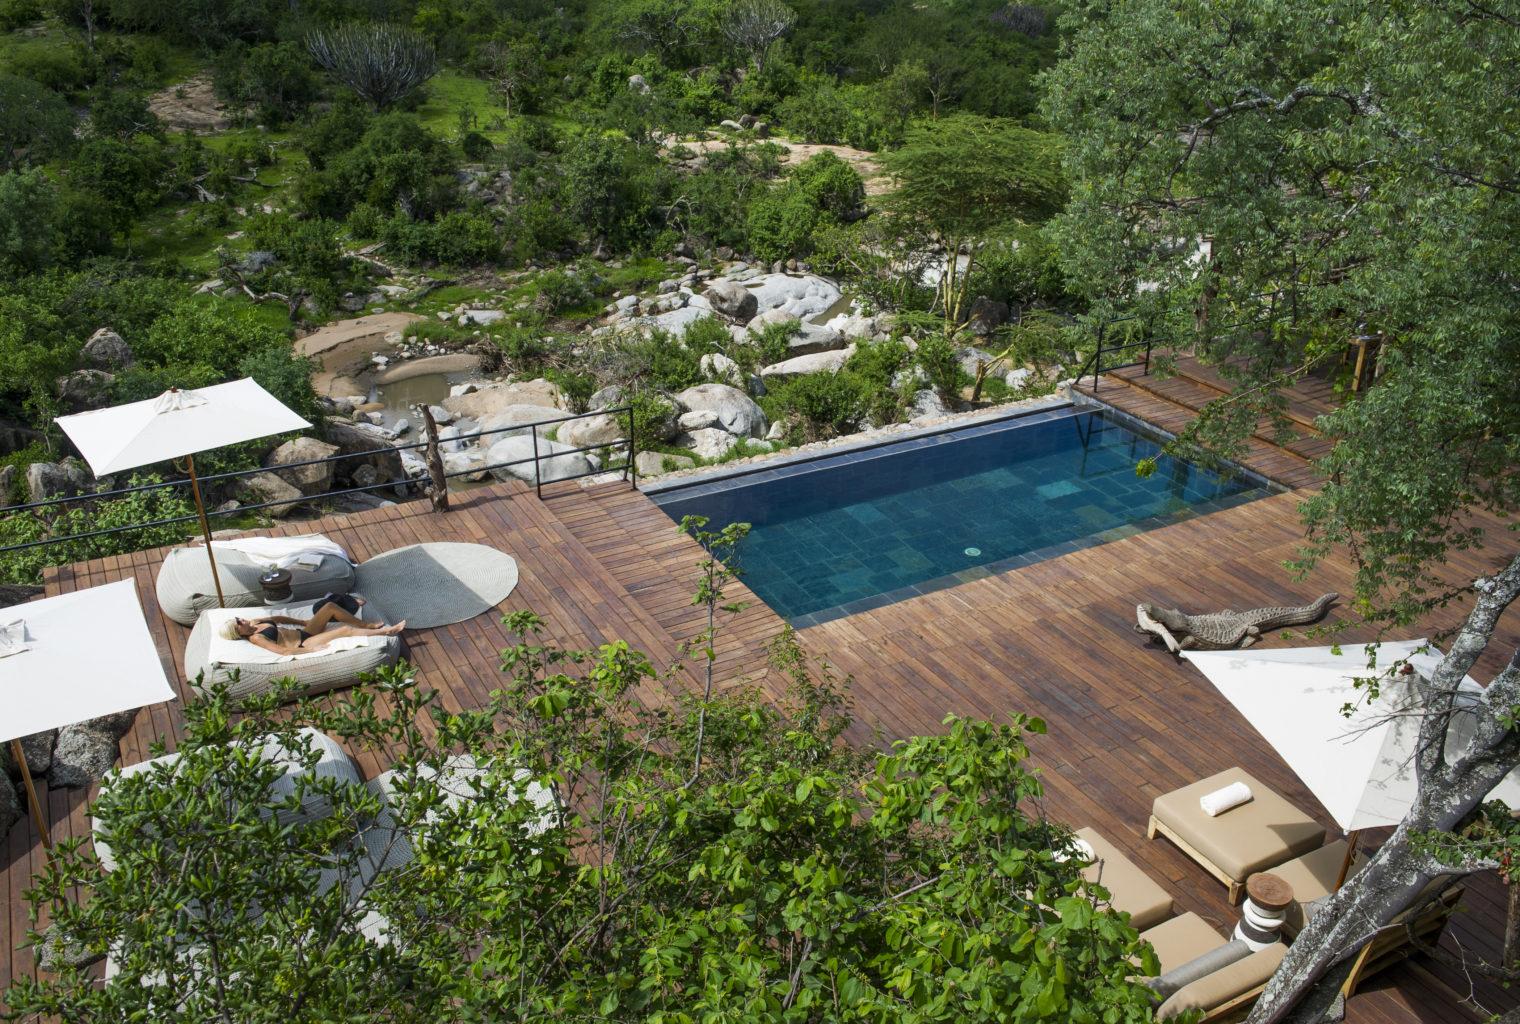 Mwiba Lodge Swimming Pool Aerial Shot